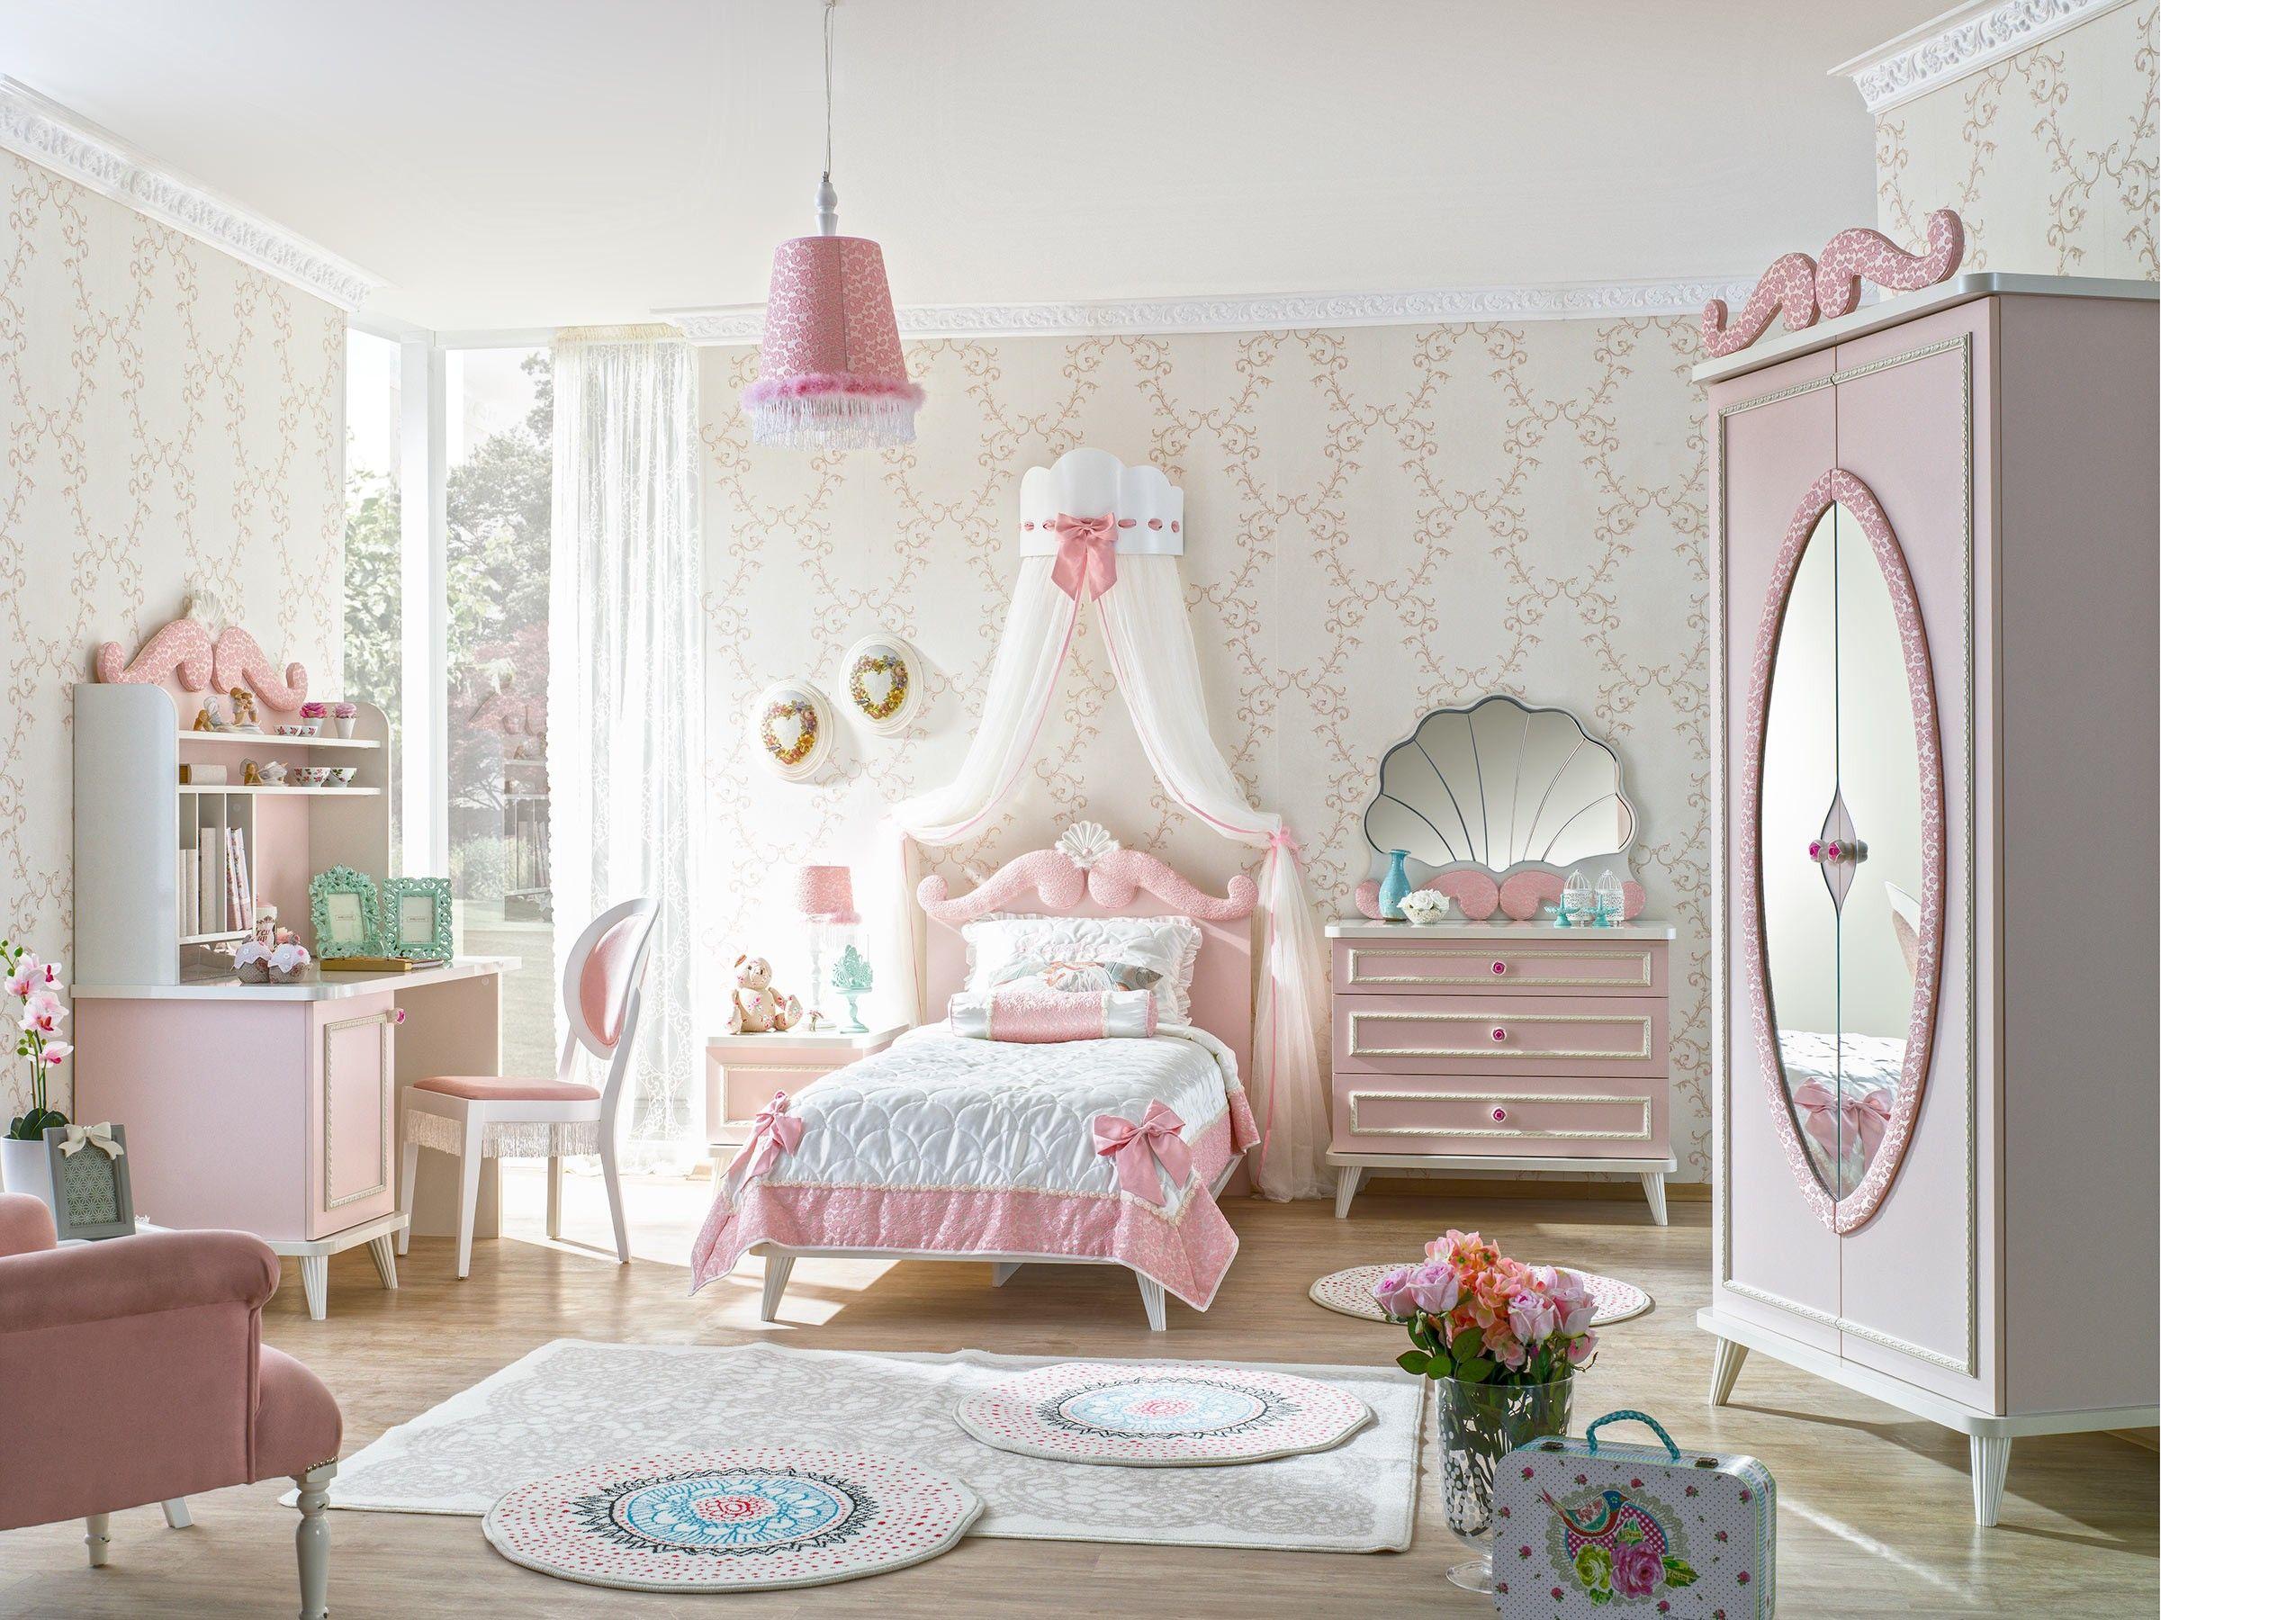 Chambre De Fille Style Baroque Recherche Google Chambre De Fille Style Baroque Chambre